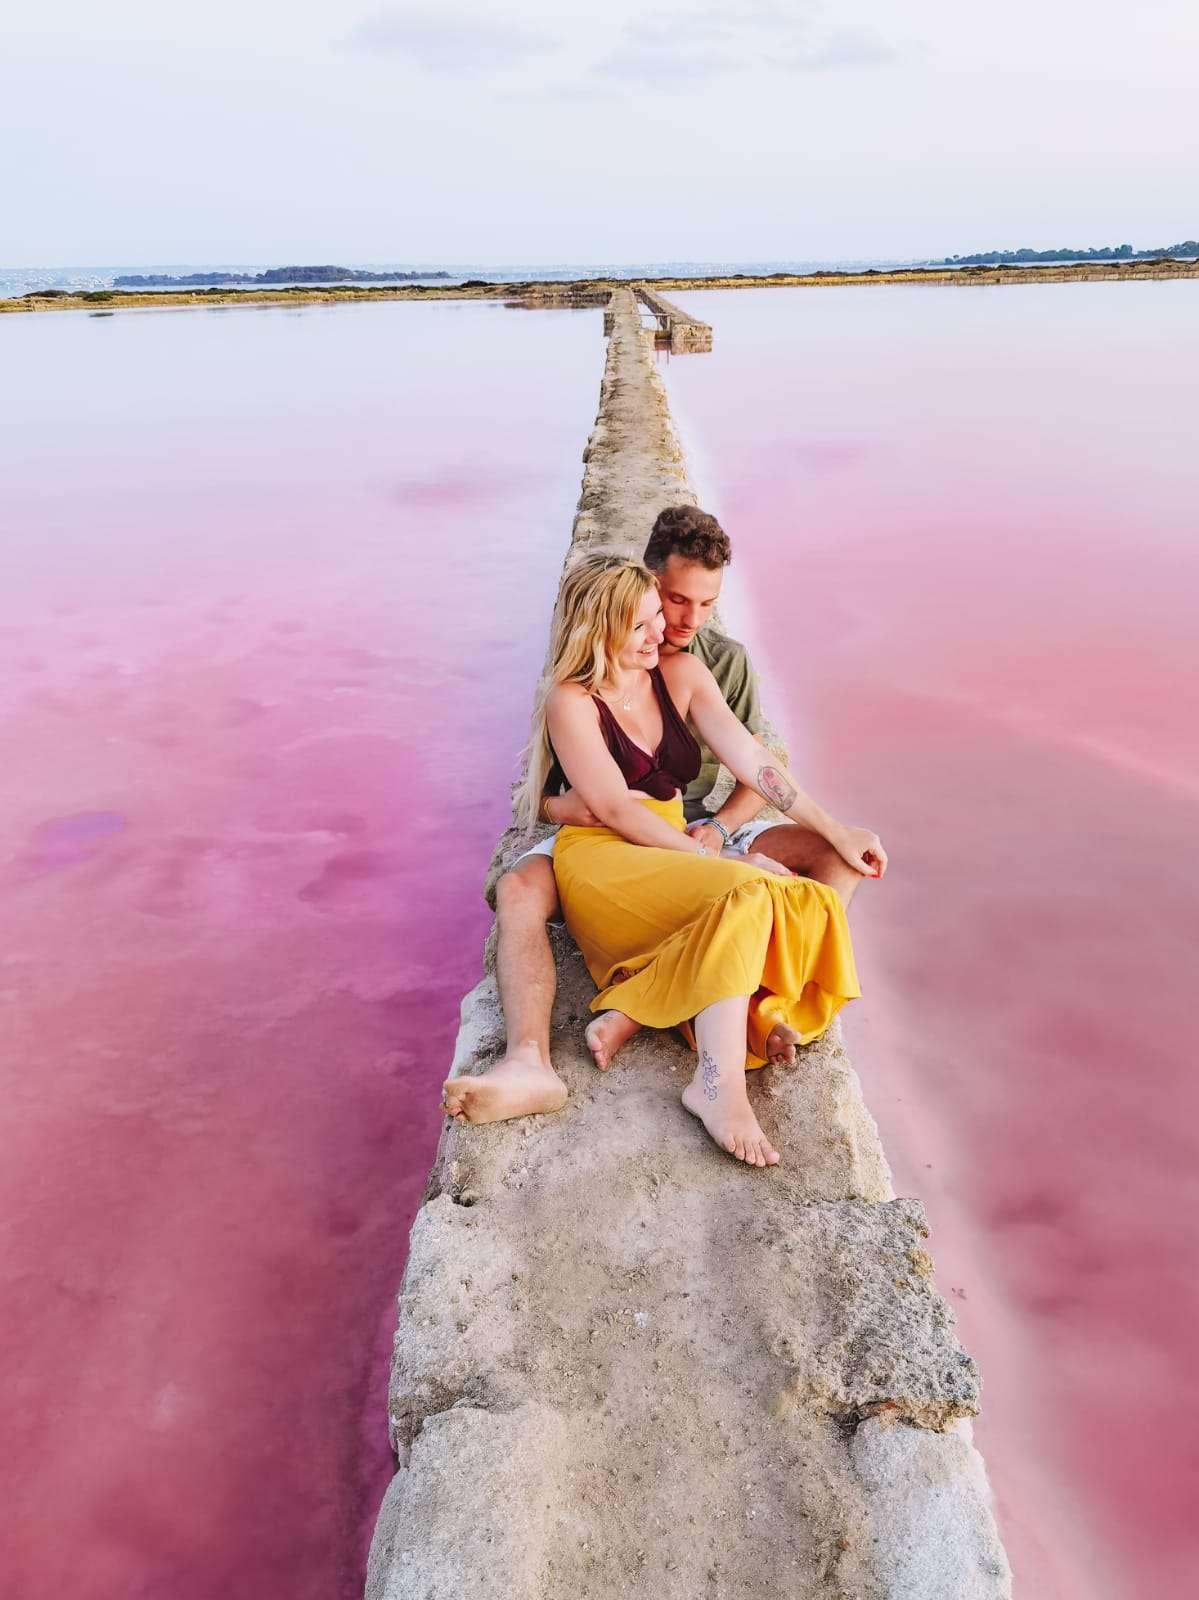 saline rosa a Marsala-sara-lorenzo-vasche